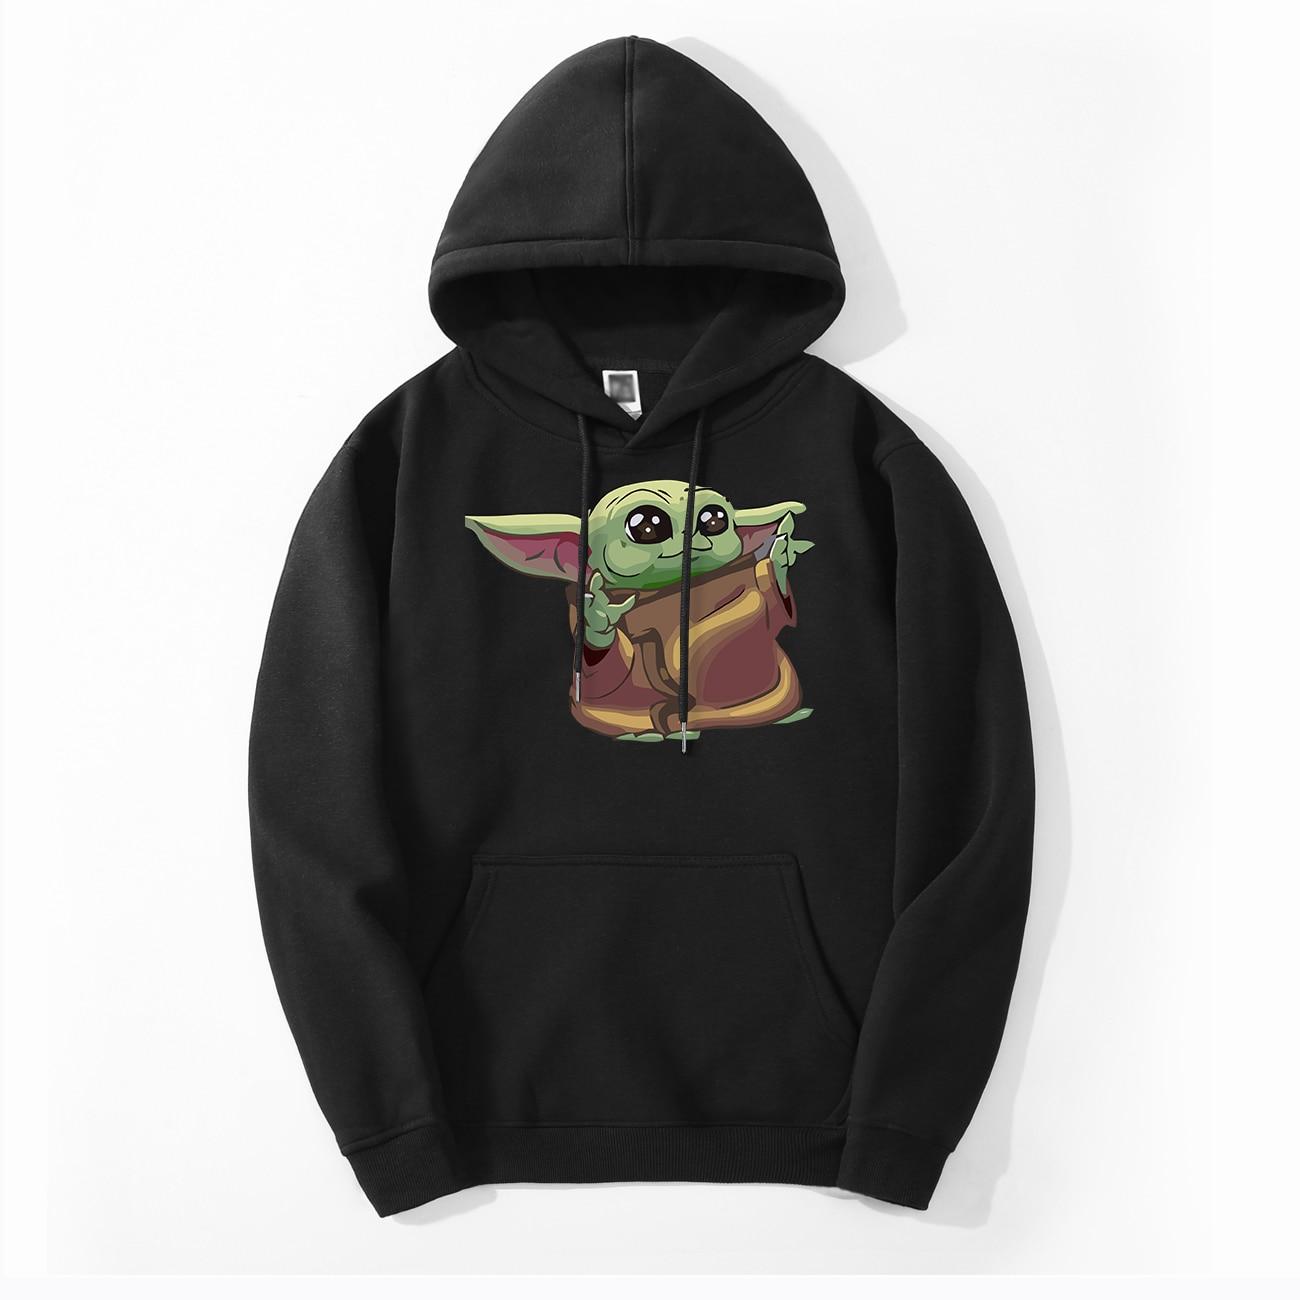 Bebe Yoda Men's Child Yoda Hoodies Spring Autumn Hoodies Sweatshirts Men Fleece Tops The Mandalorian Star War Hoodies Sweatshirt